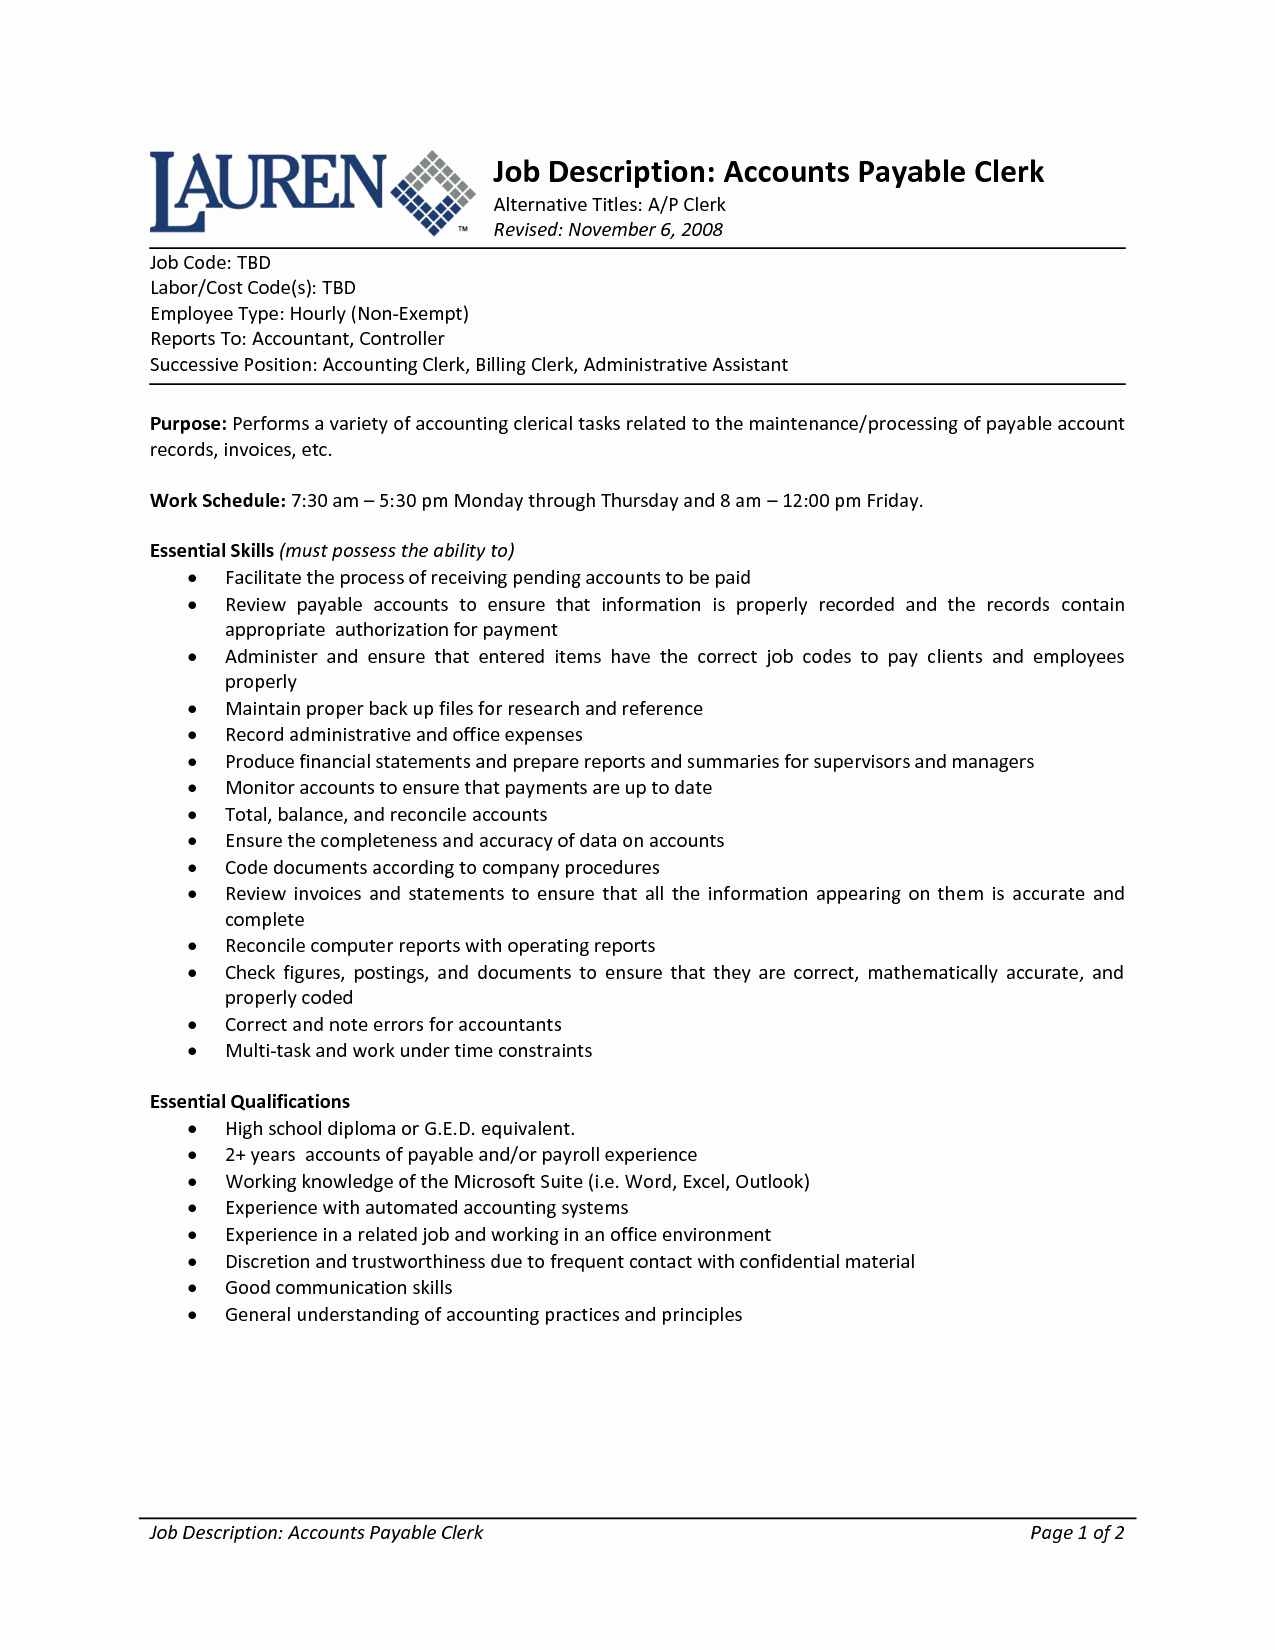 Accounting Clerk Job Description for Resume